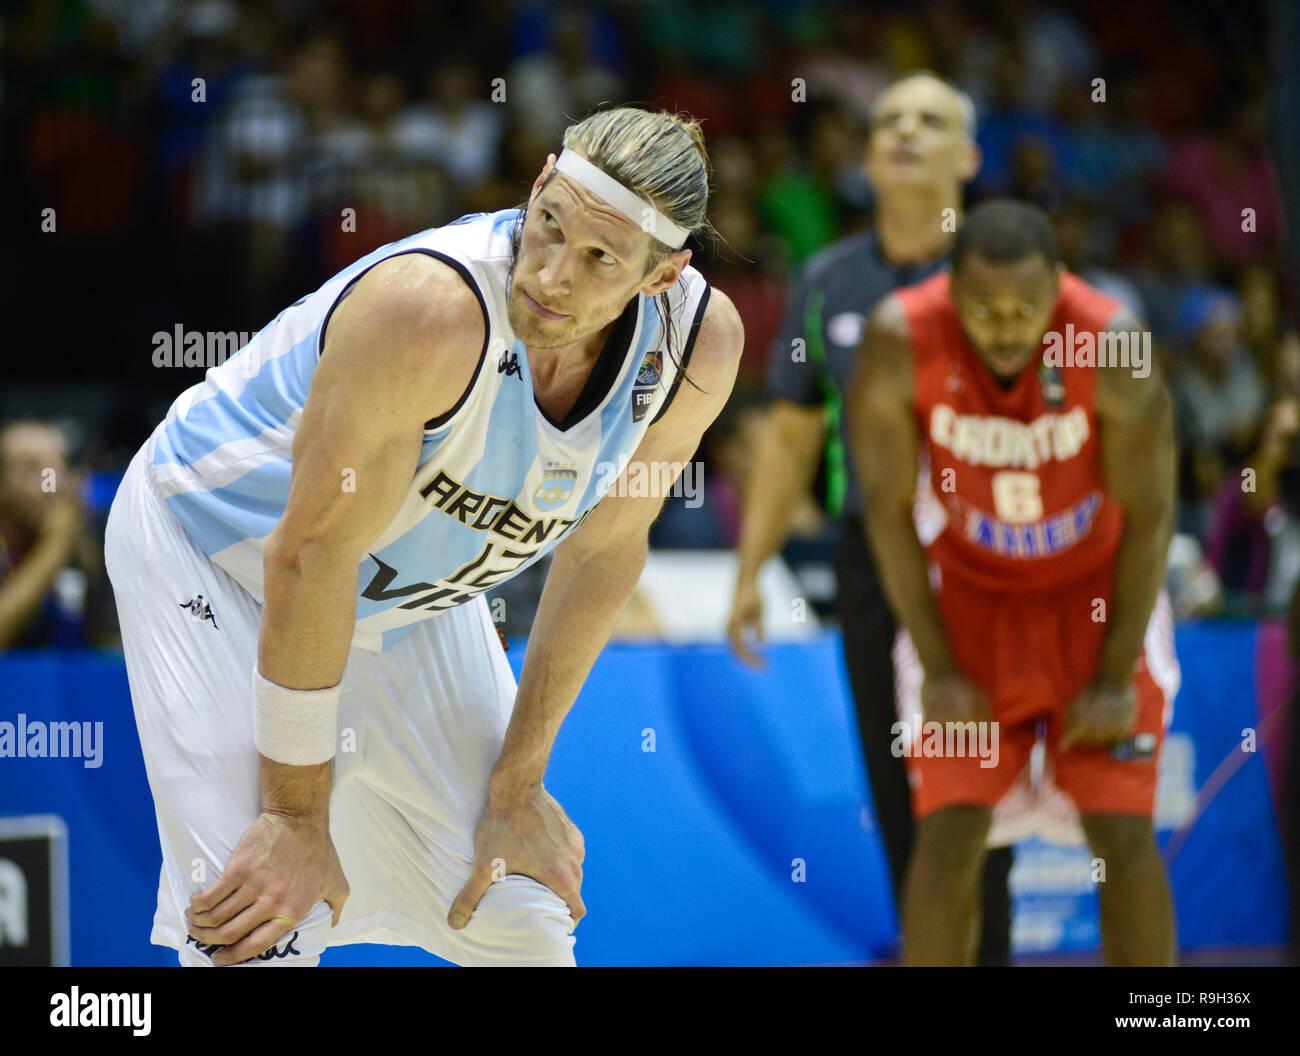 Walter Herrmann. Argentina Basketball National Team. FIBA Basketball World Cup, Spain 2014 - Stock Image